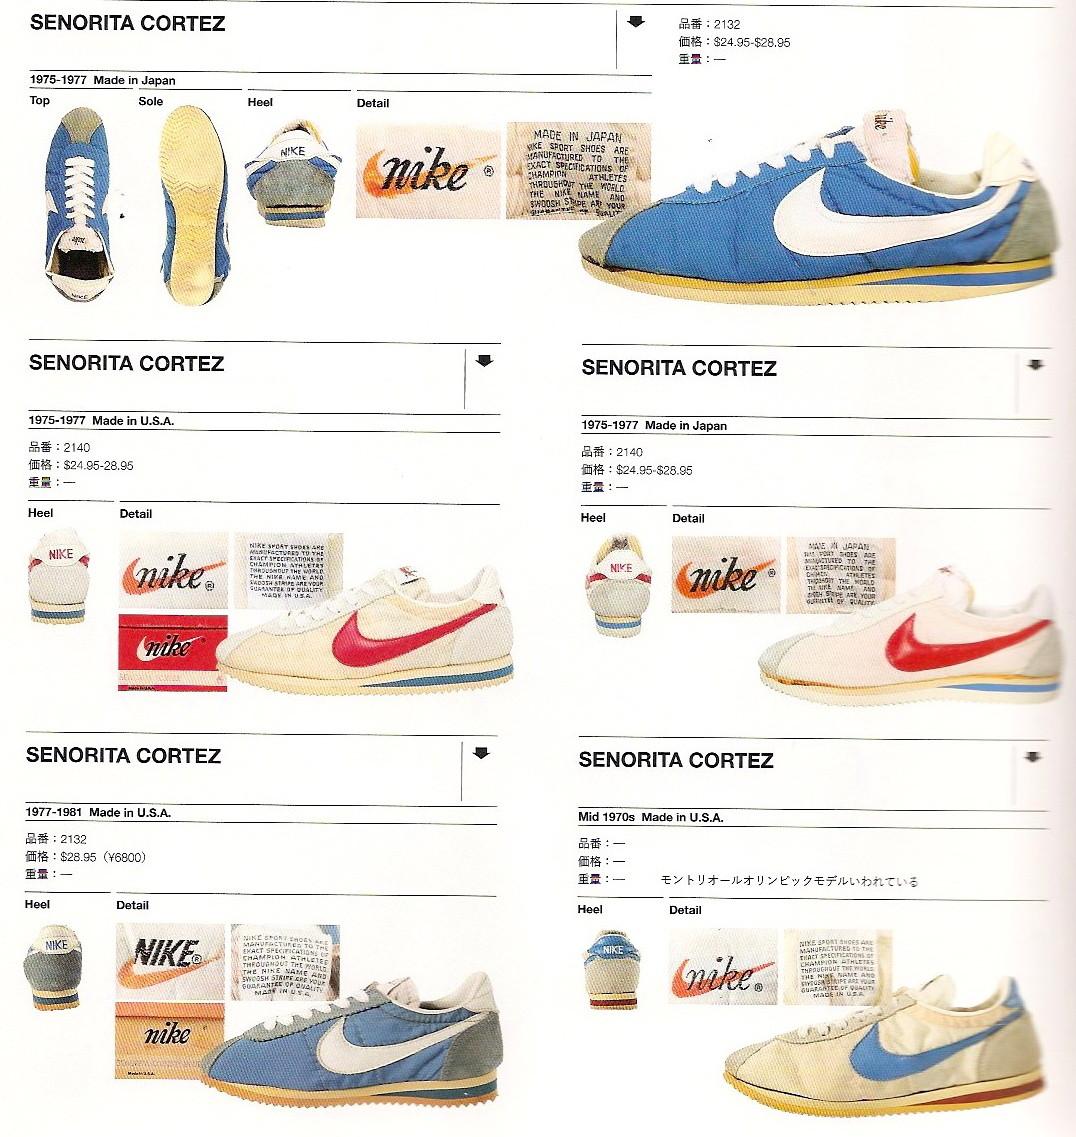 competitive price 228b5 0bd28 new concept 4ace0 12be1 nike senorita cortez 1975 1981 ...